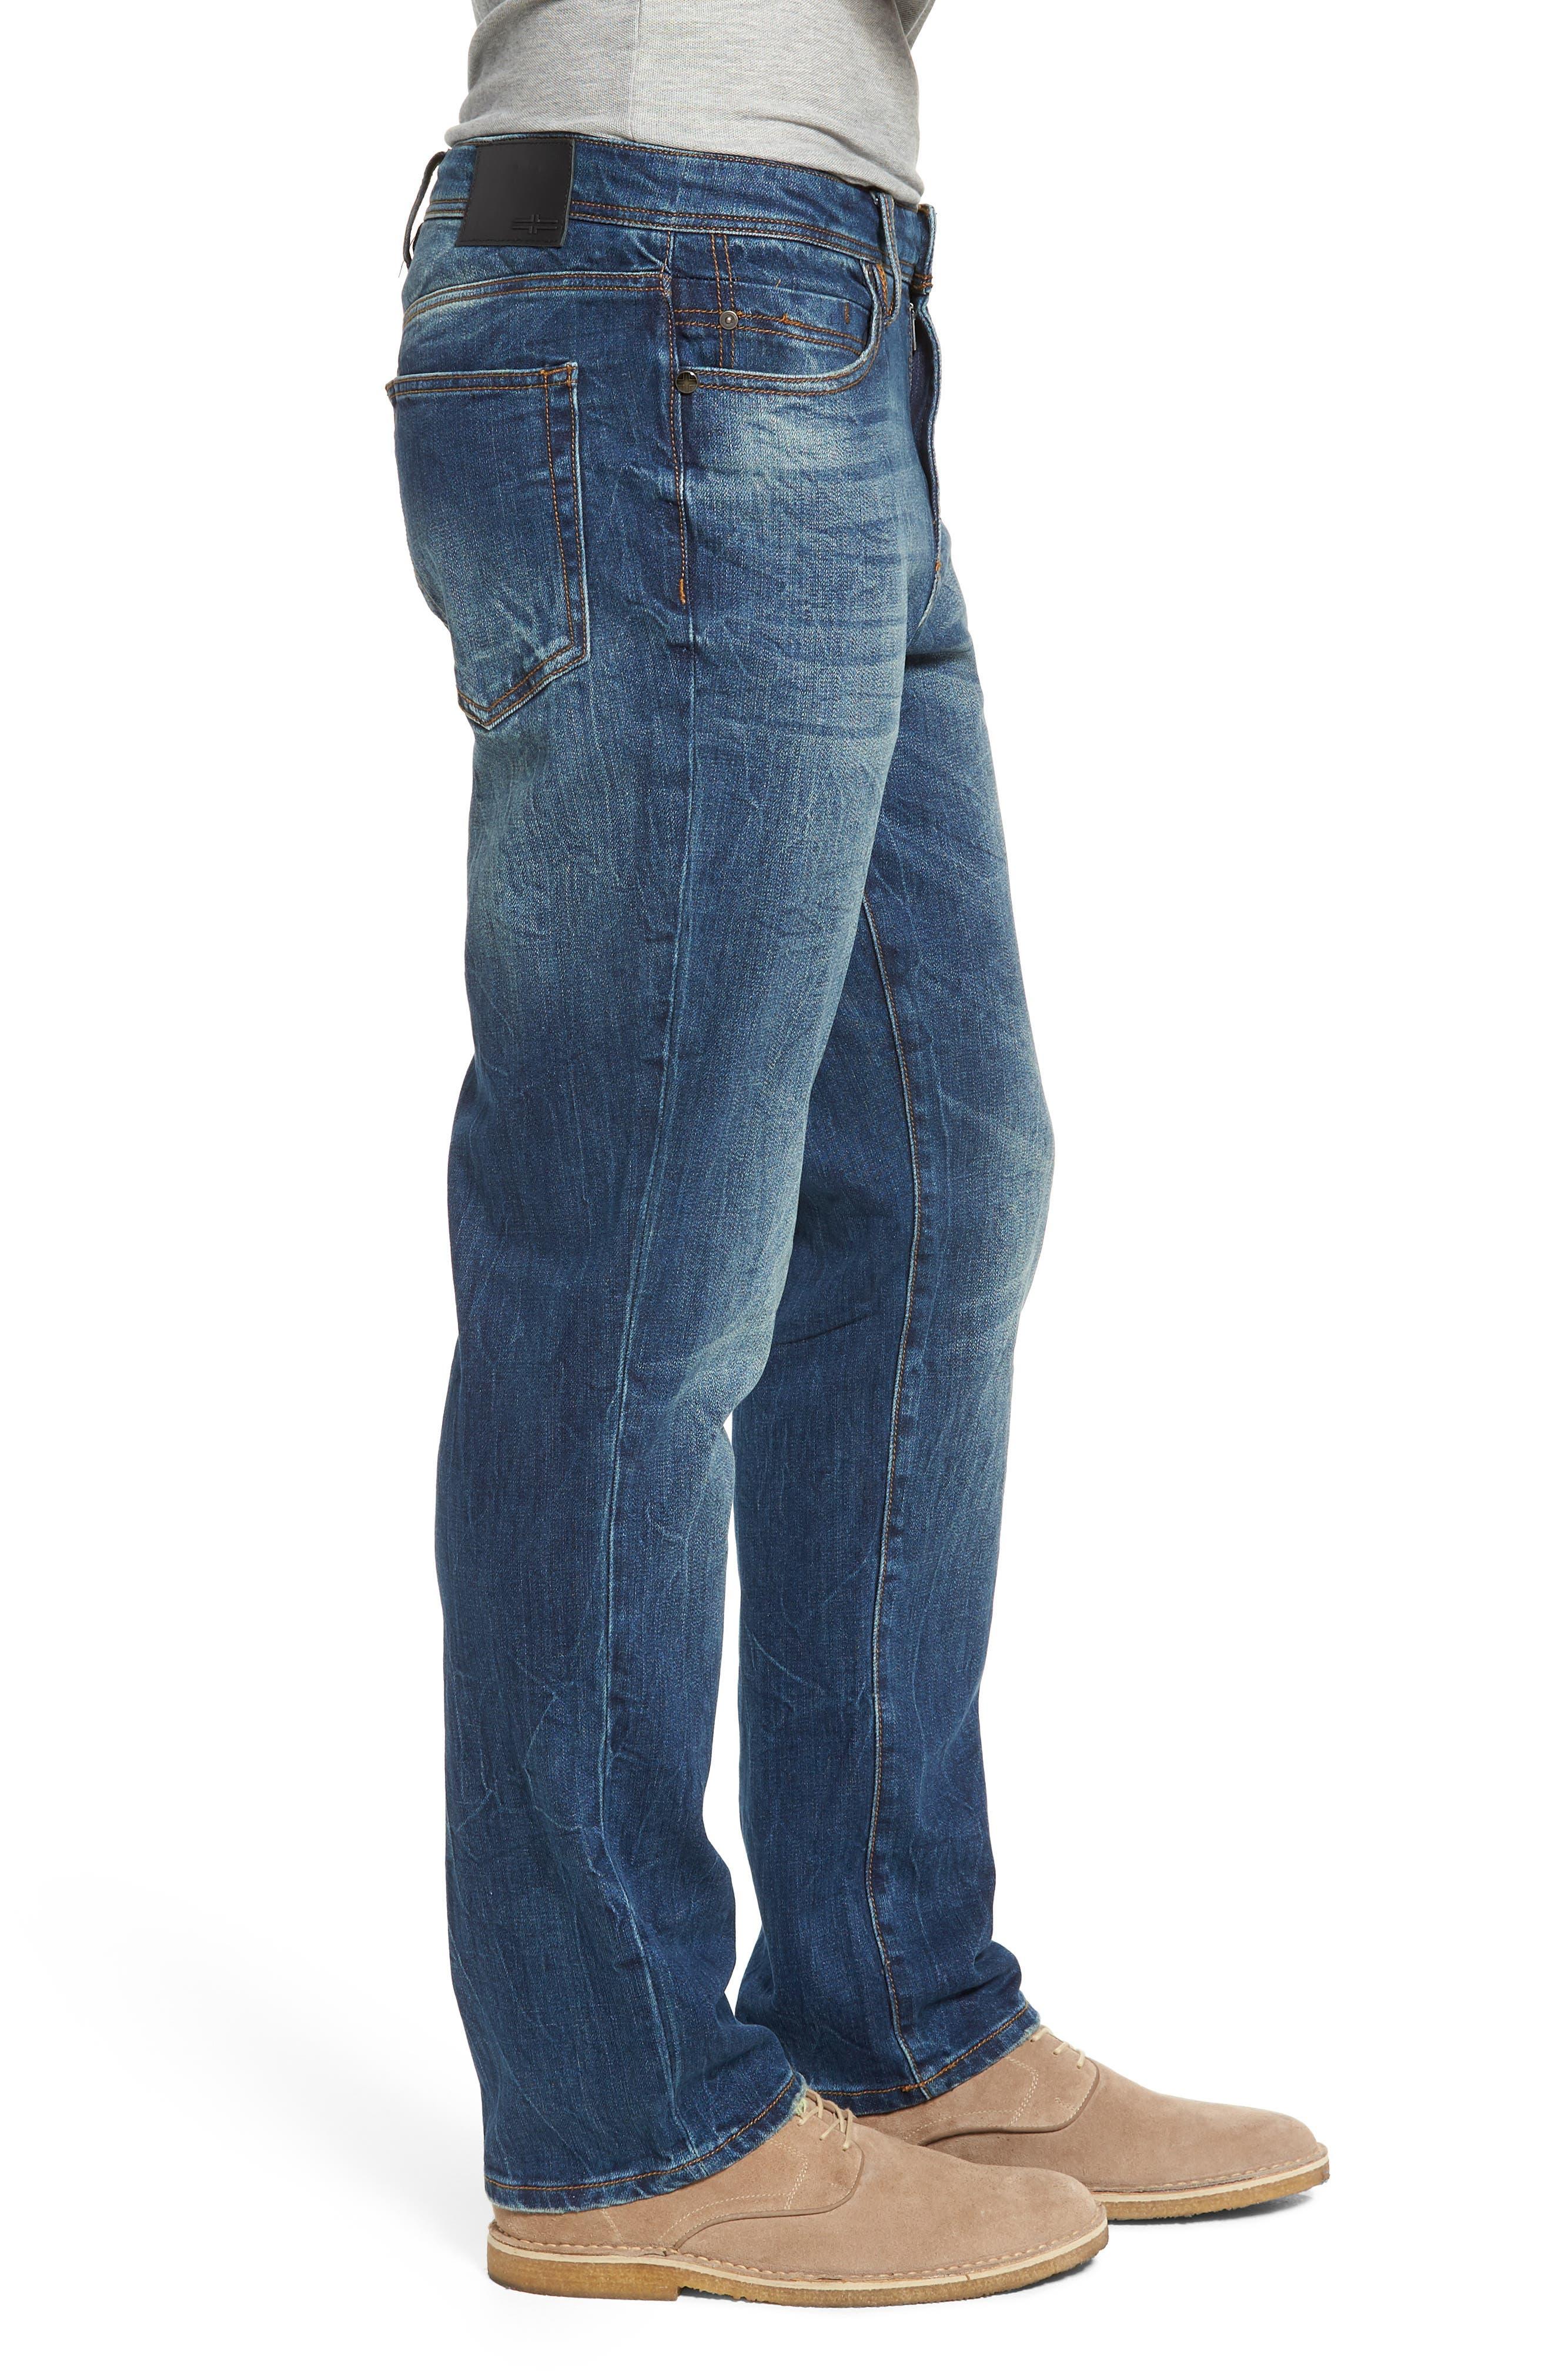 Jeans Co. Regent Relaxed Fit Jeans,                             Alternate thumbnail 3, color,                             ODESSA VINTAGE MEDIUM